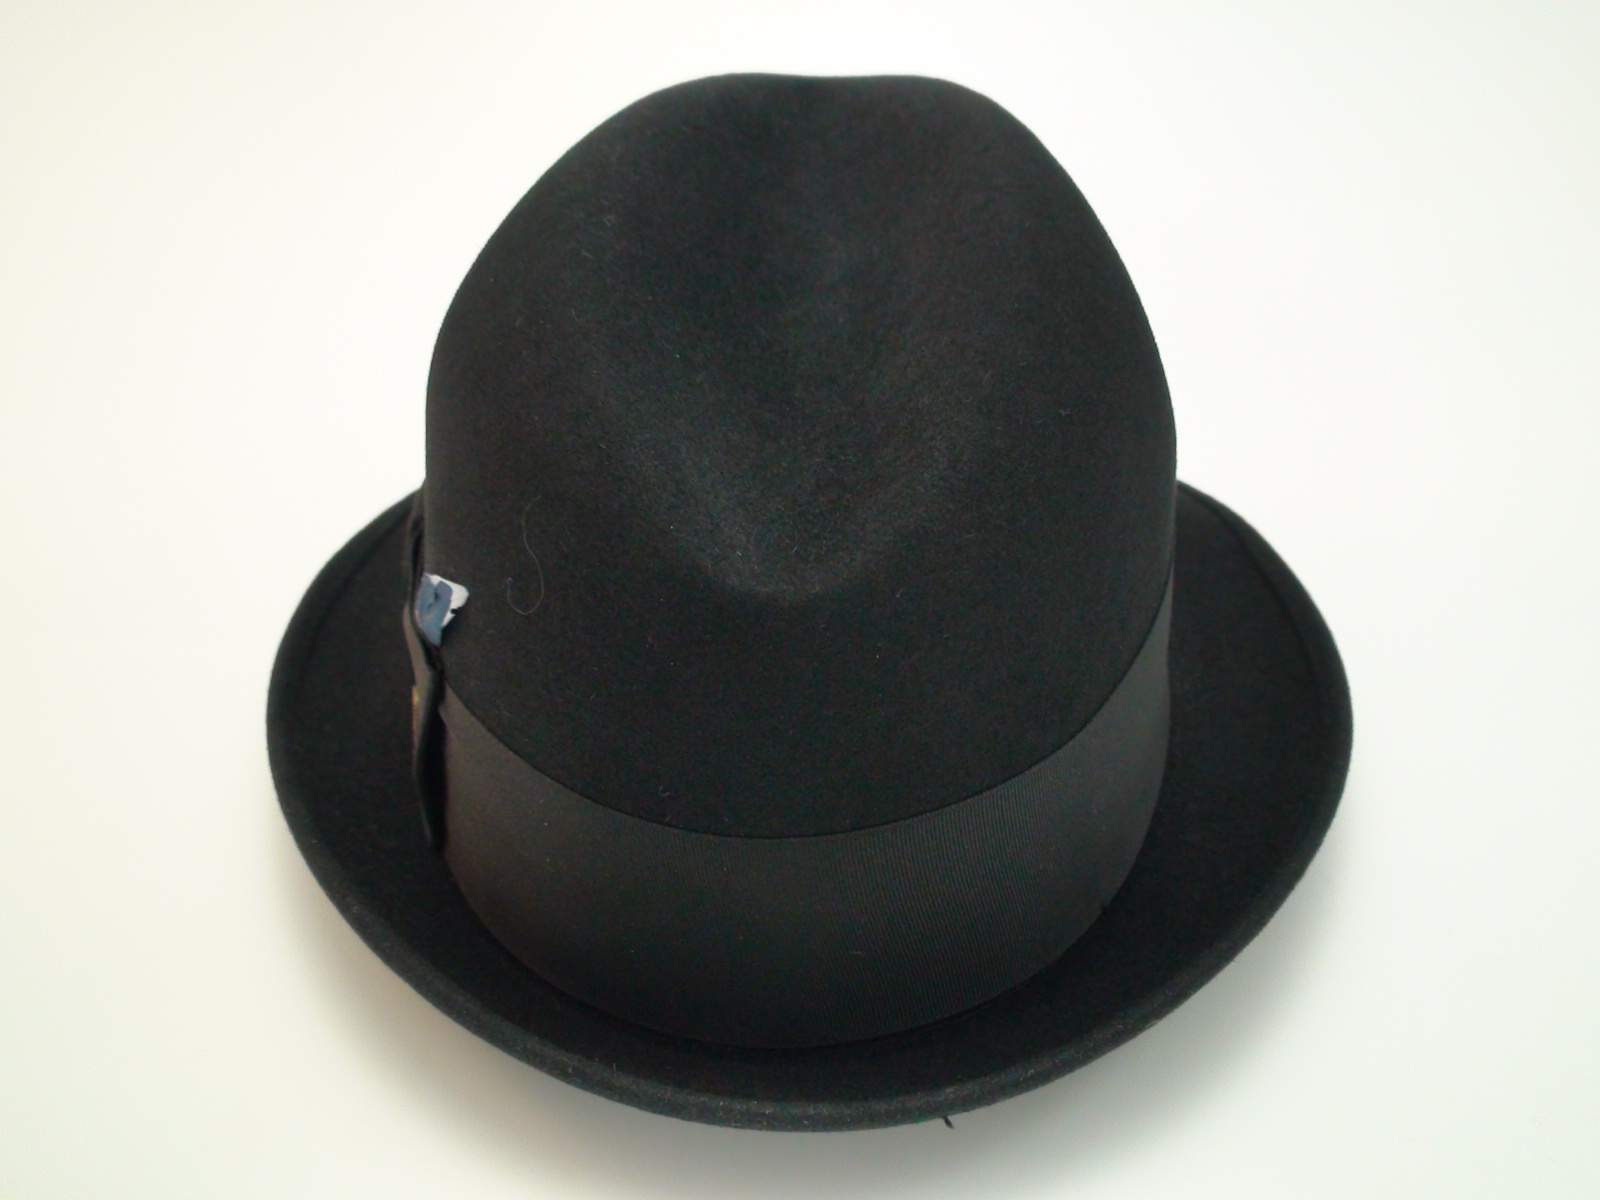 d3e91d49a44 Champ Hats Kasmir Finish Black Fur Felt Trilby Fedora Hat